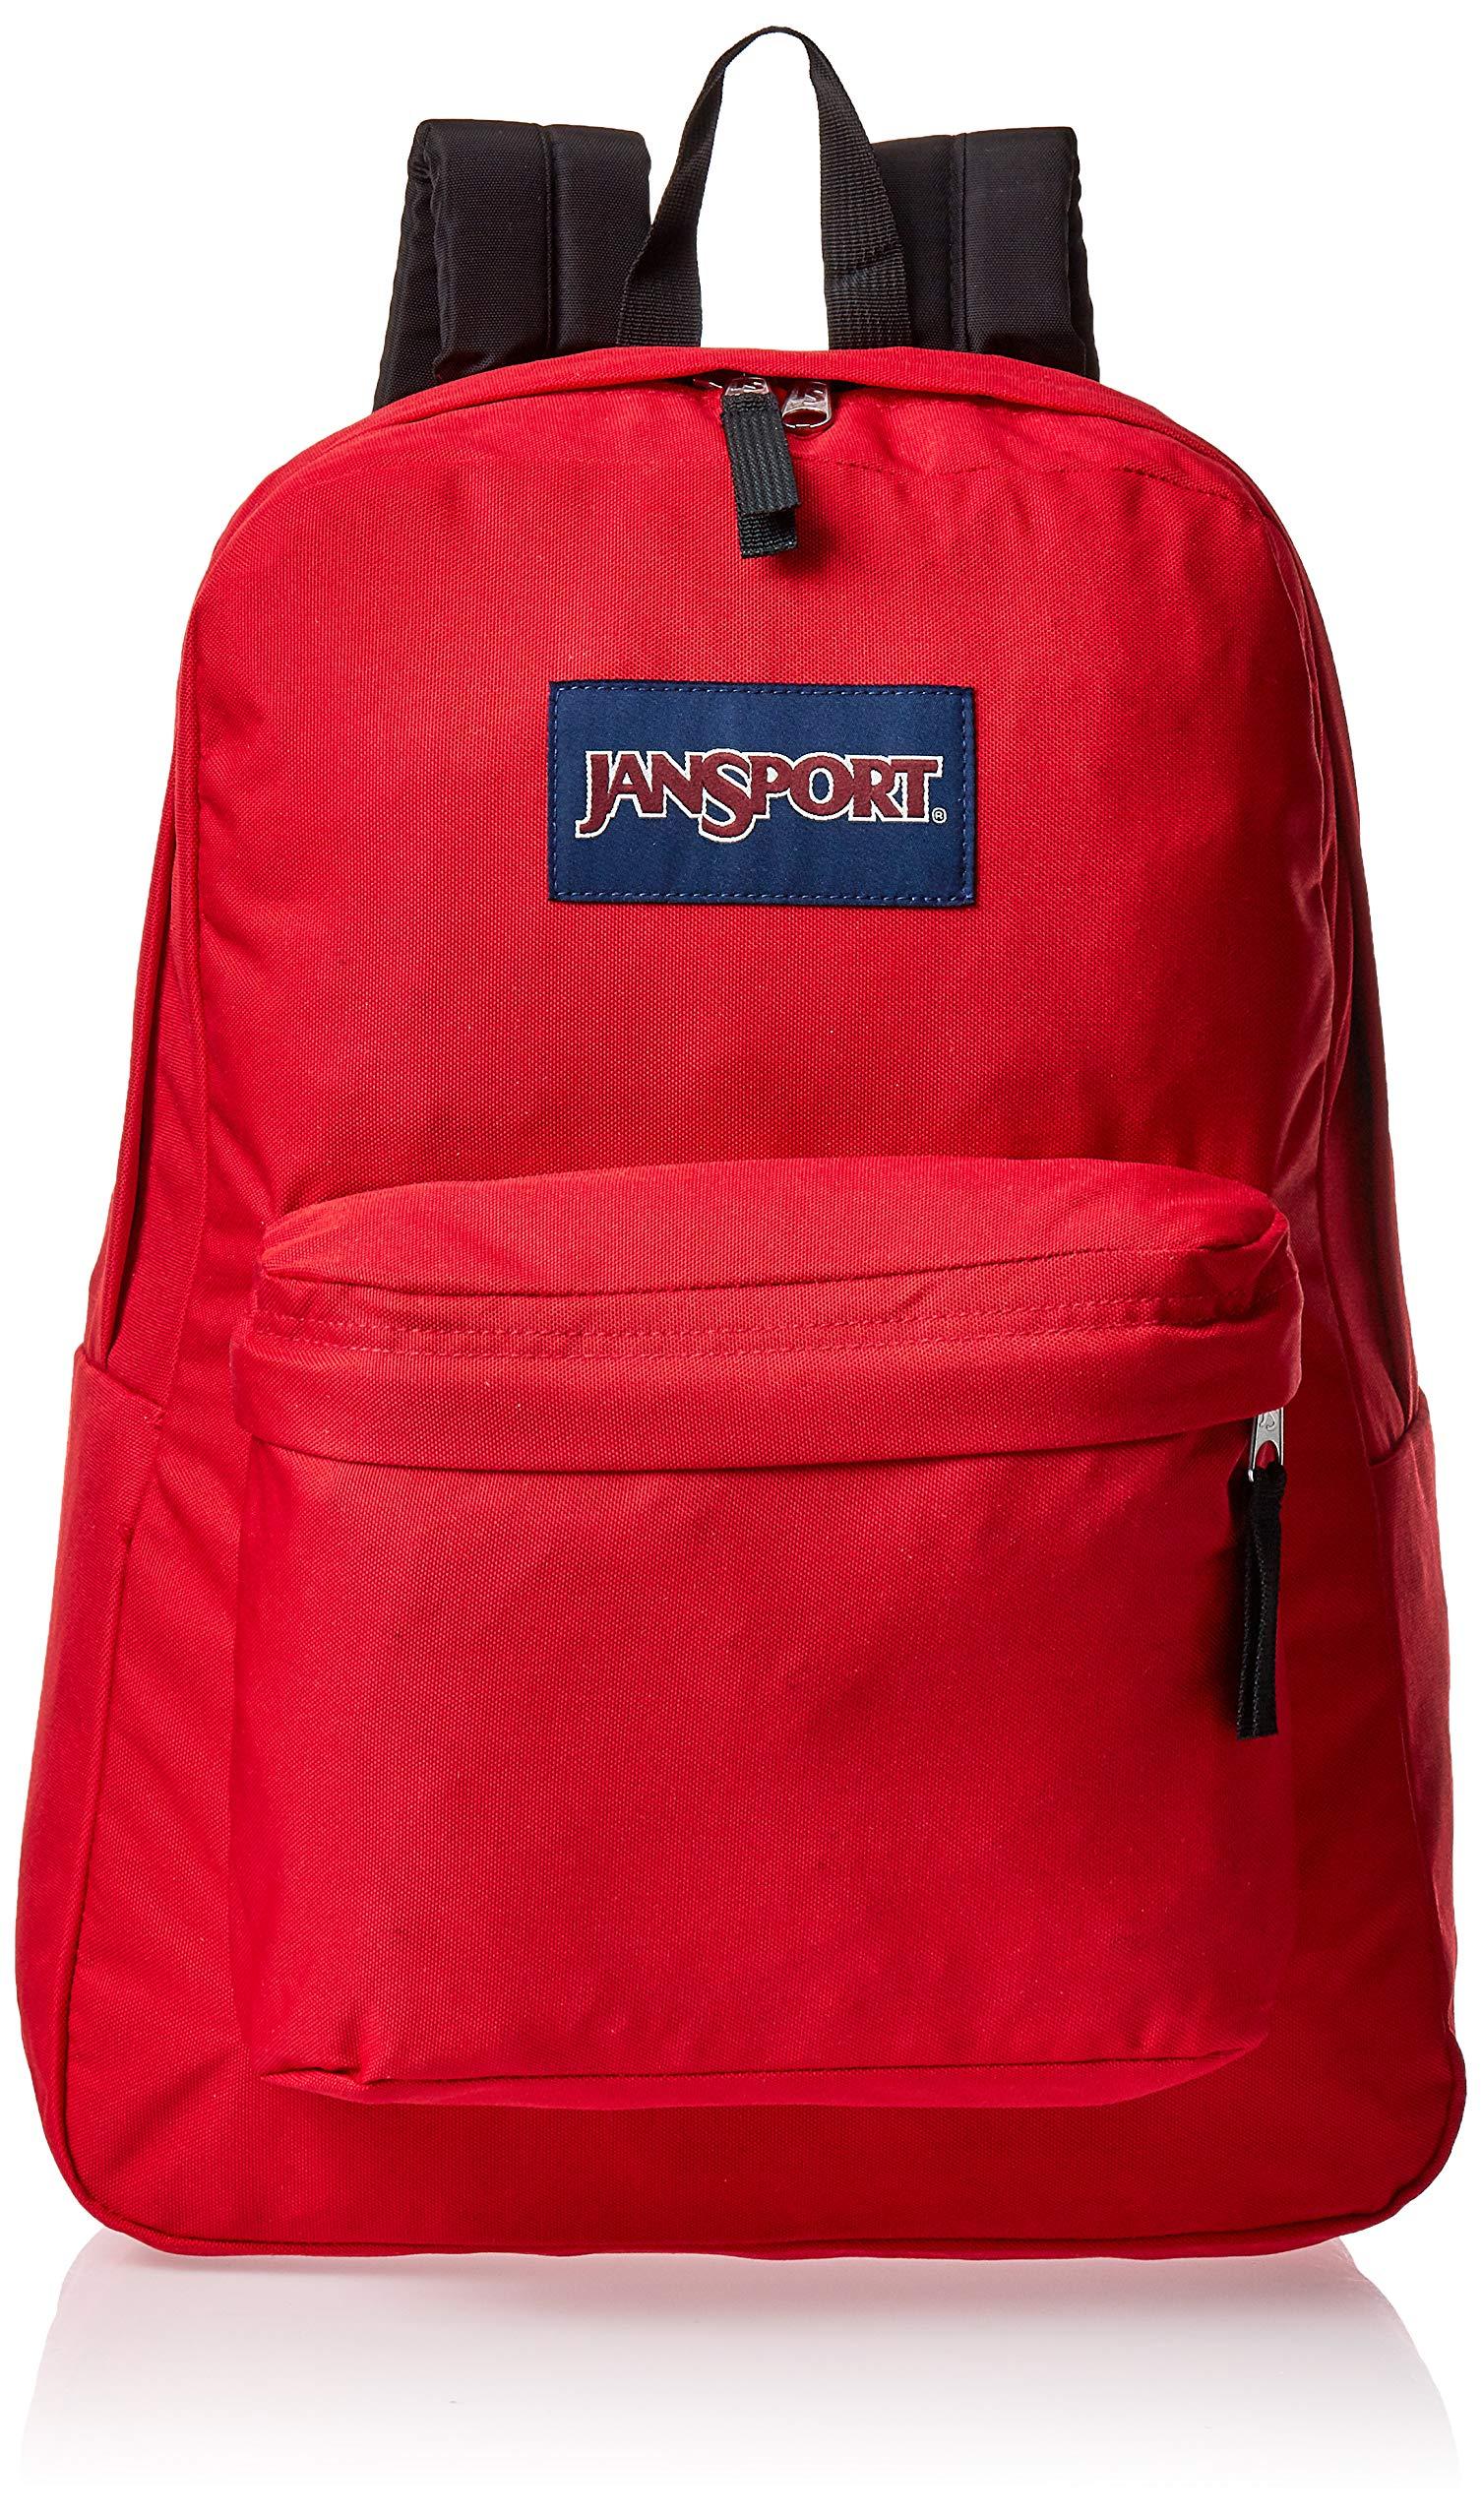 JanSport SuperBreak One Backpack - Lightweight School Bookbag- Buy Online in Pakistan at desertcart.pk. ProductId : 2888917.